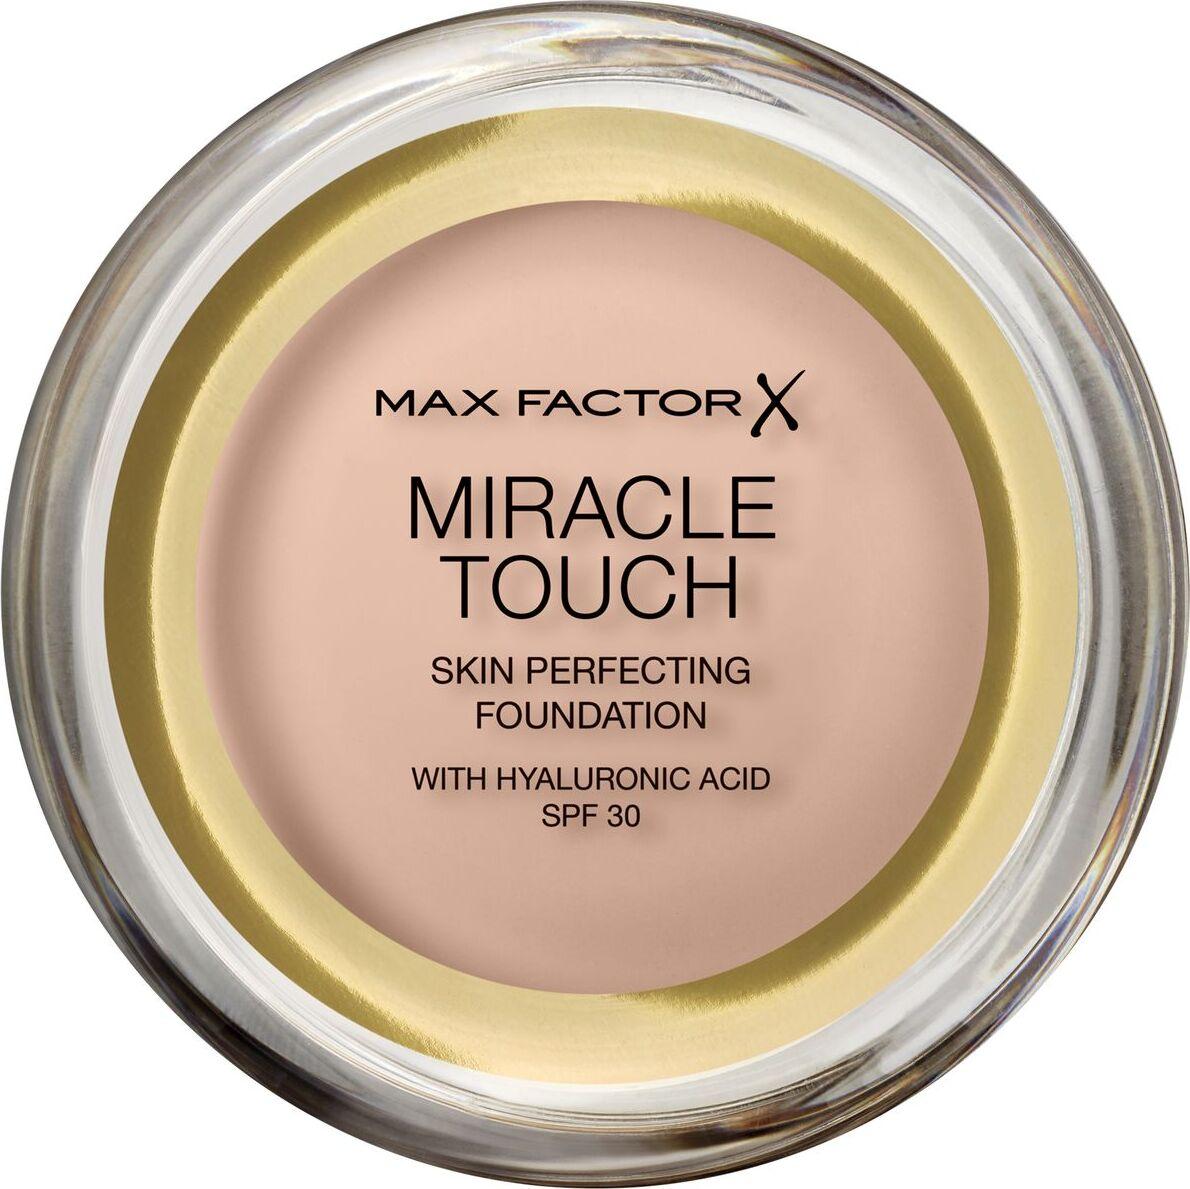 Тональная основа Max Factor Miracle Touch, SPF 30, тон 38 Light Ivory, 11 мл основа под макияж max factor miracle prep colour correcting cooling тон green 30 мл